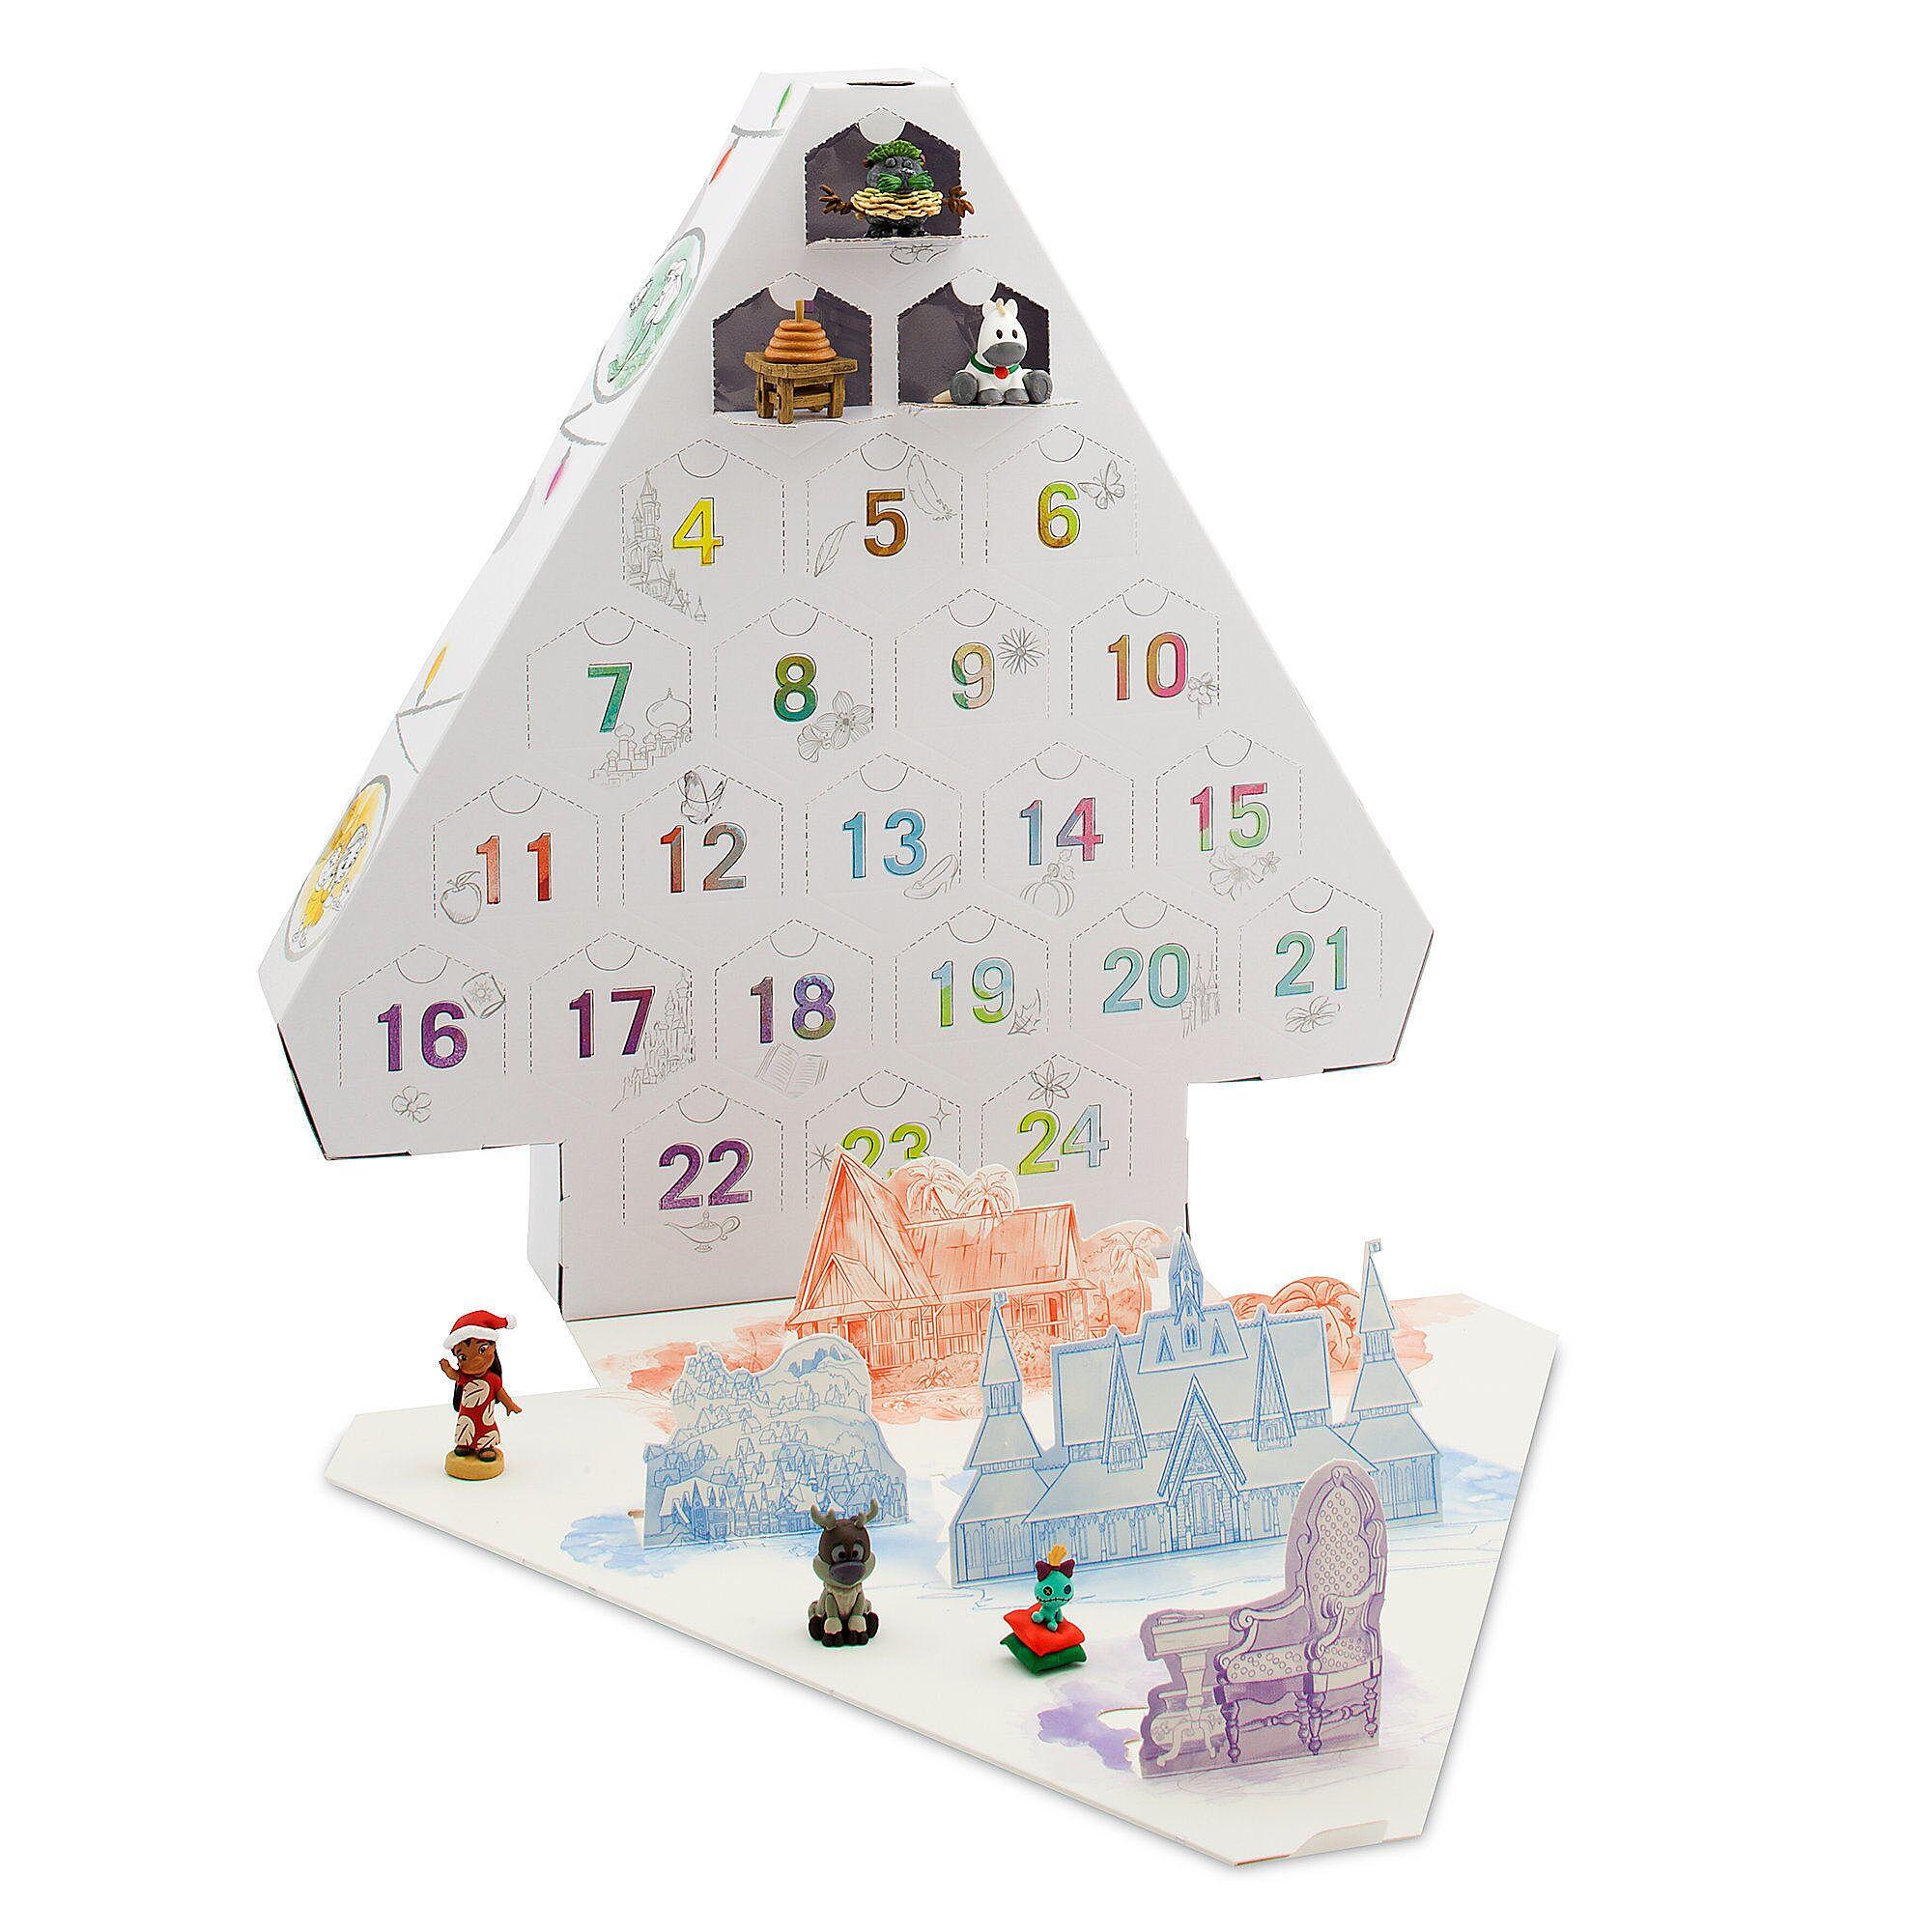 Calendario Countdown.15 Advent Calendars That Guarantee A Nerdy Countdown To